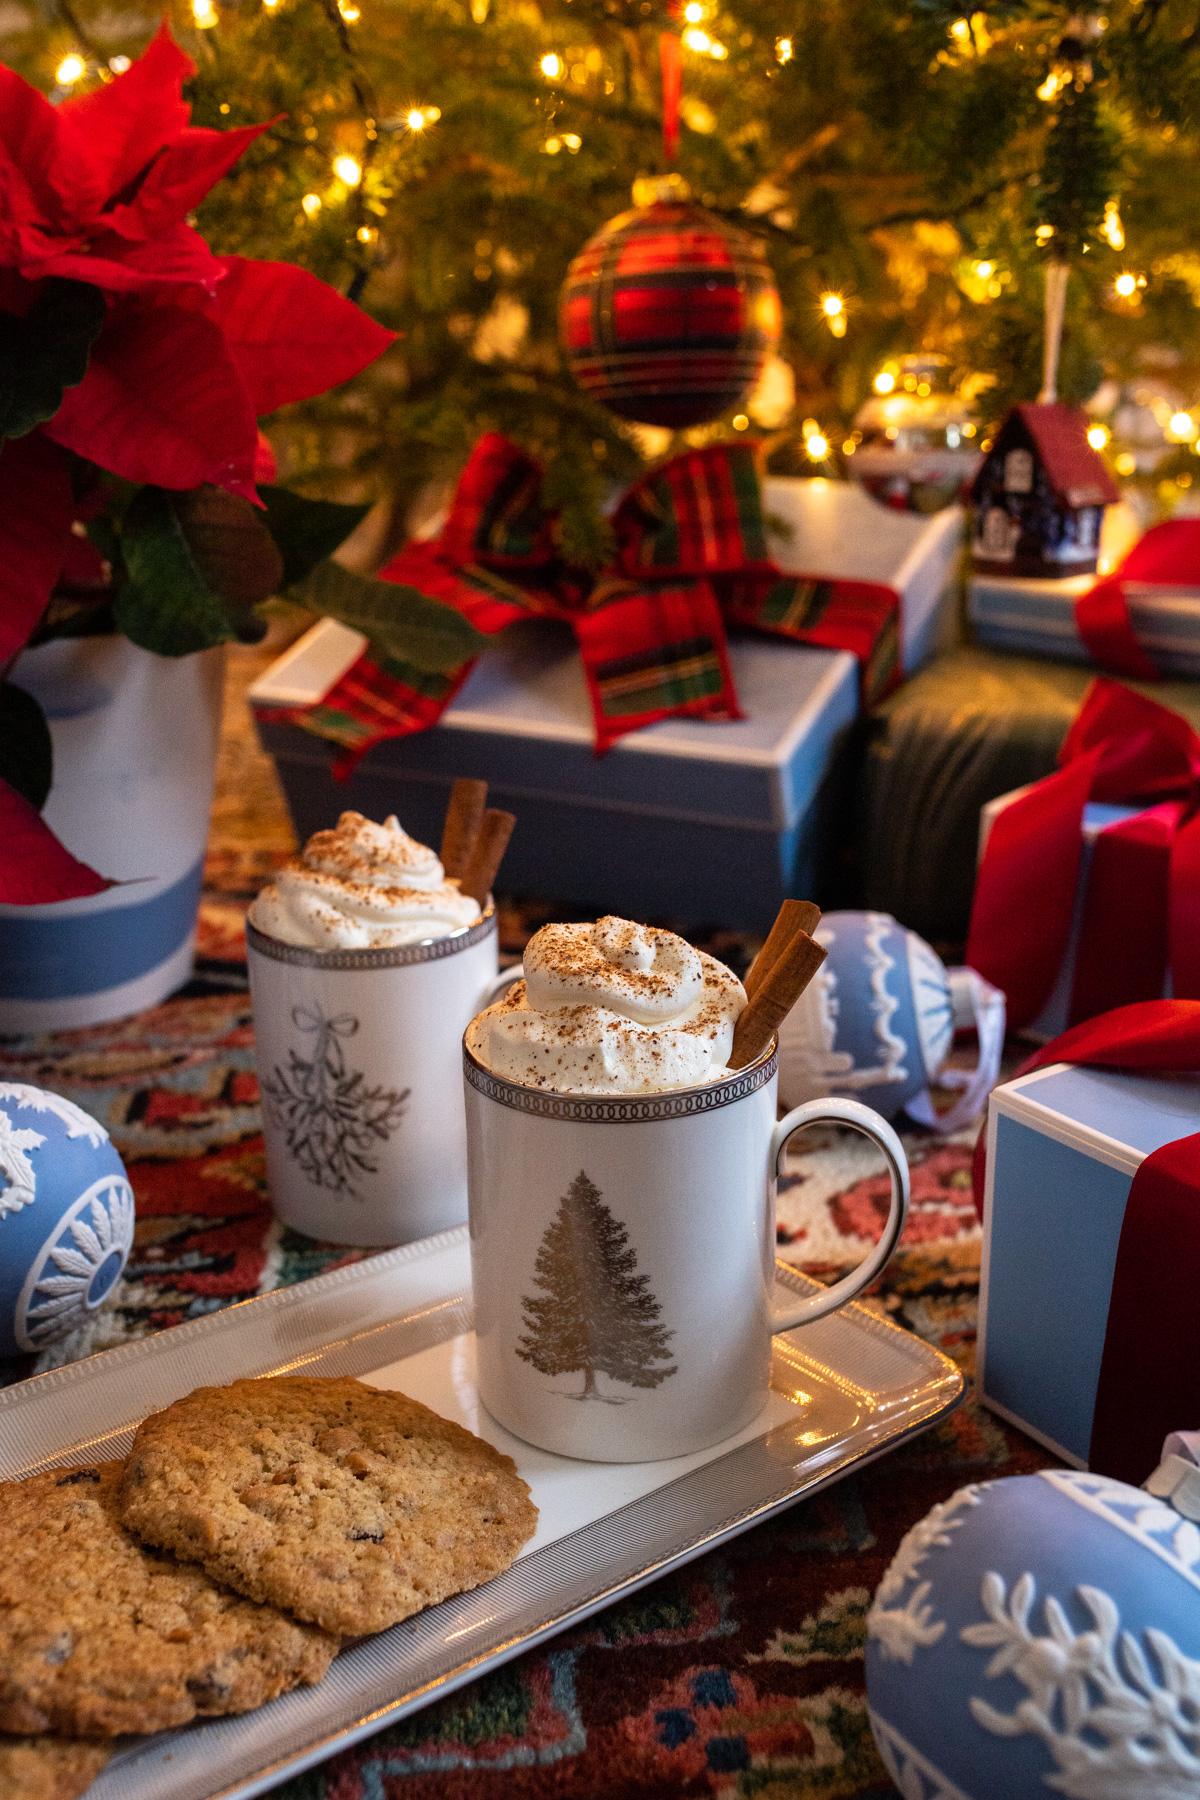 Stacie Flinner x New England Holiday Decorations-9.jpg